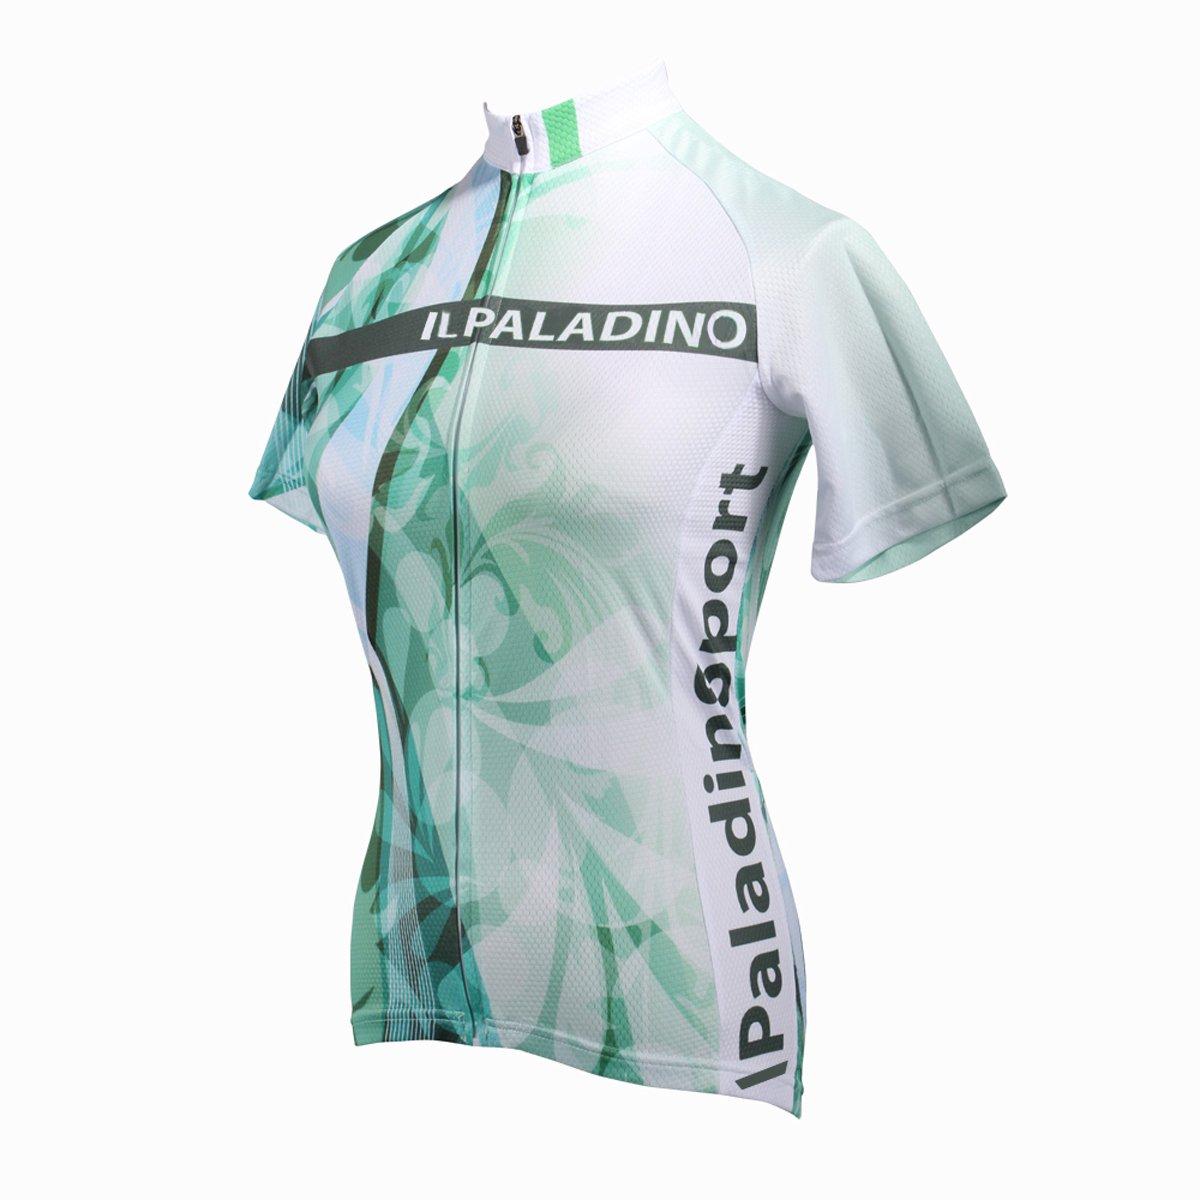 Amazon.com   Ilpaladino Women s Cycling Shirts Tight Design Bike Jerseys  for Outdoor Sports   Sports   Outdoors afee7248b